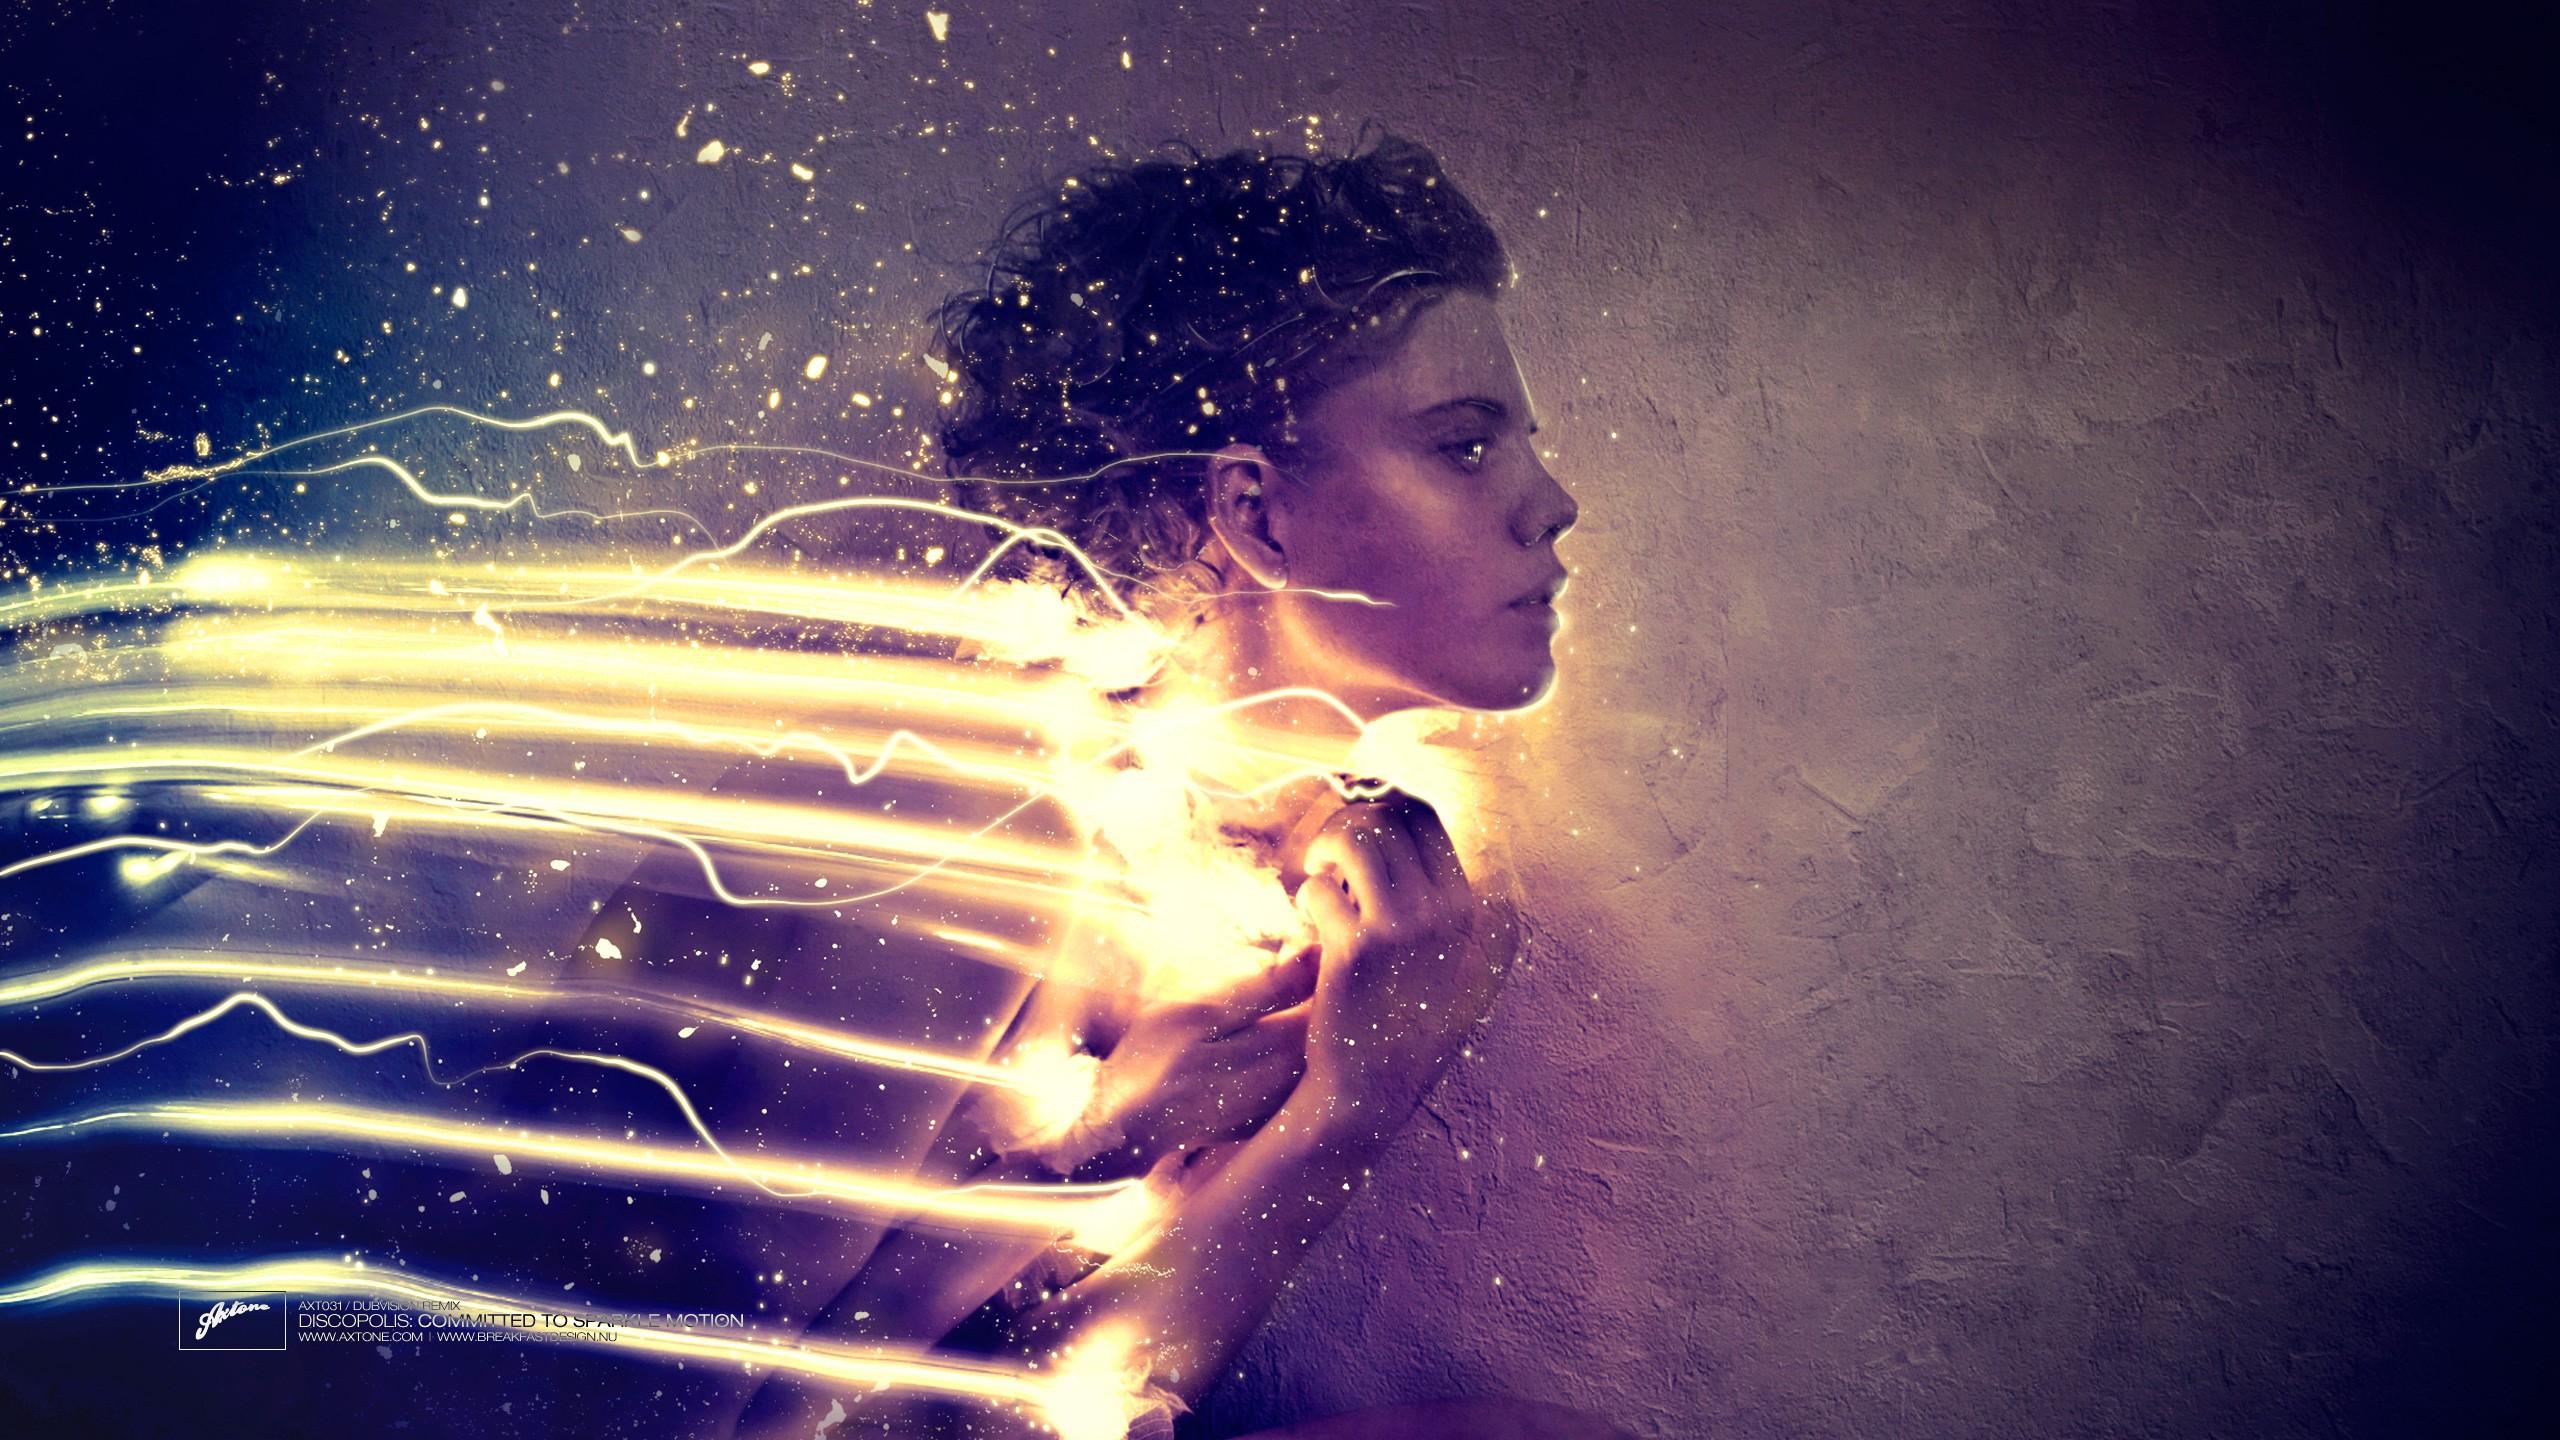 Wallpaper Sunlight Lights Night Reflection Angel Blue